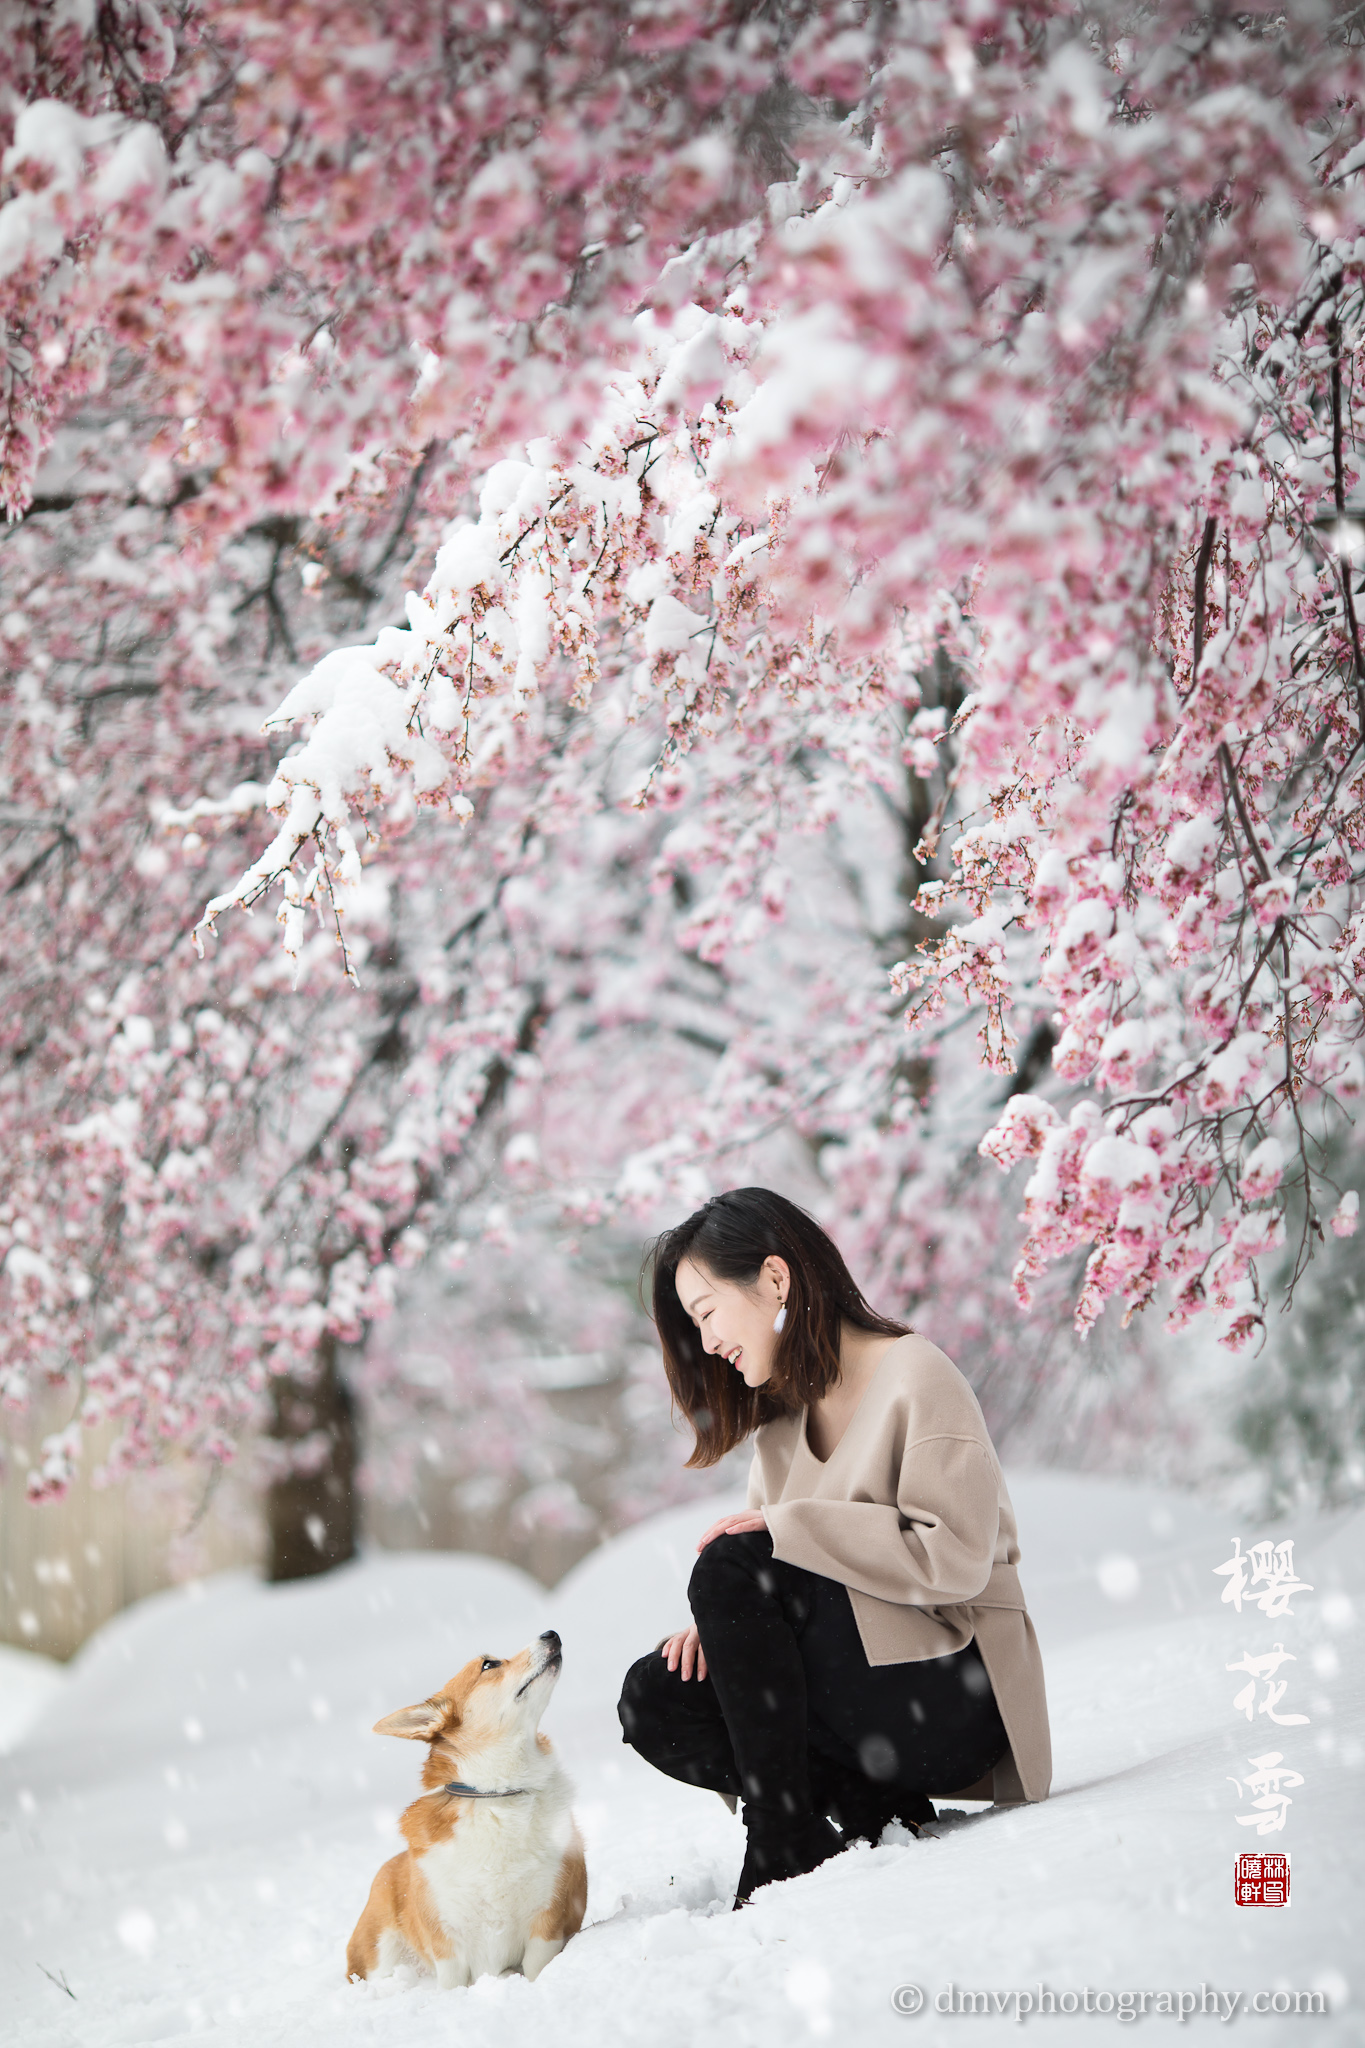 _D4_8295-snow